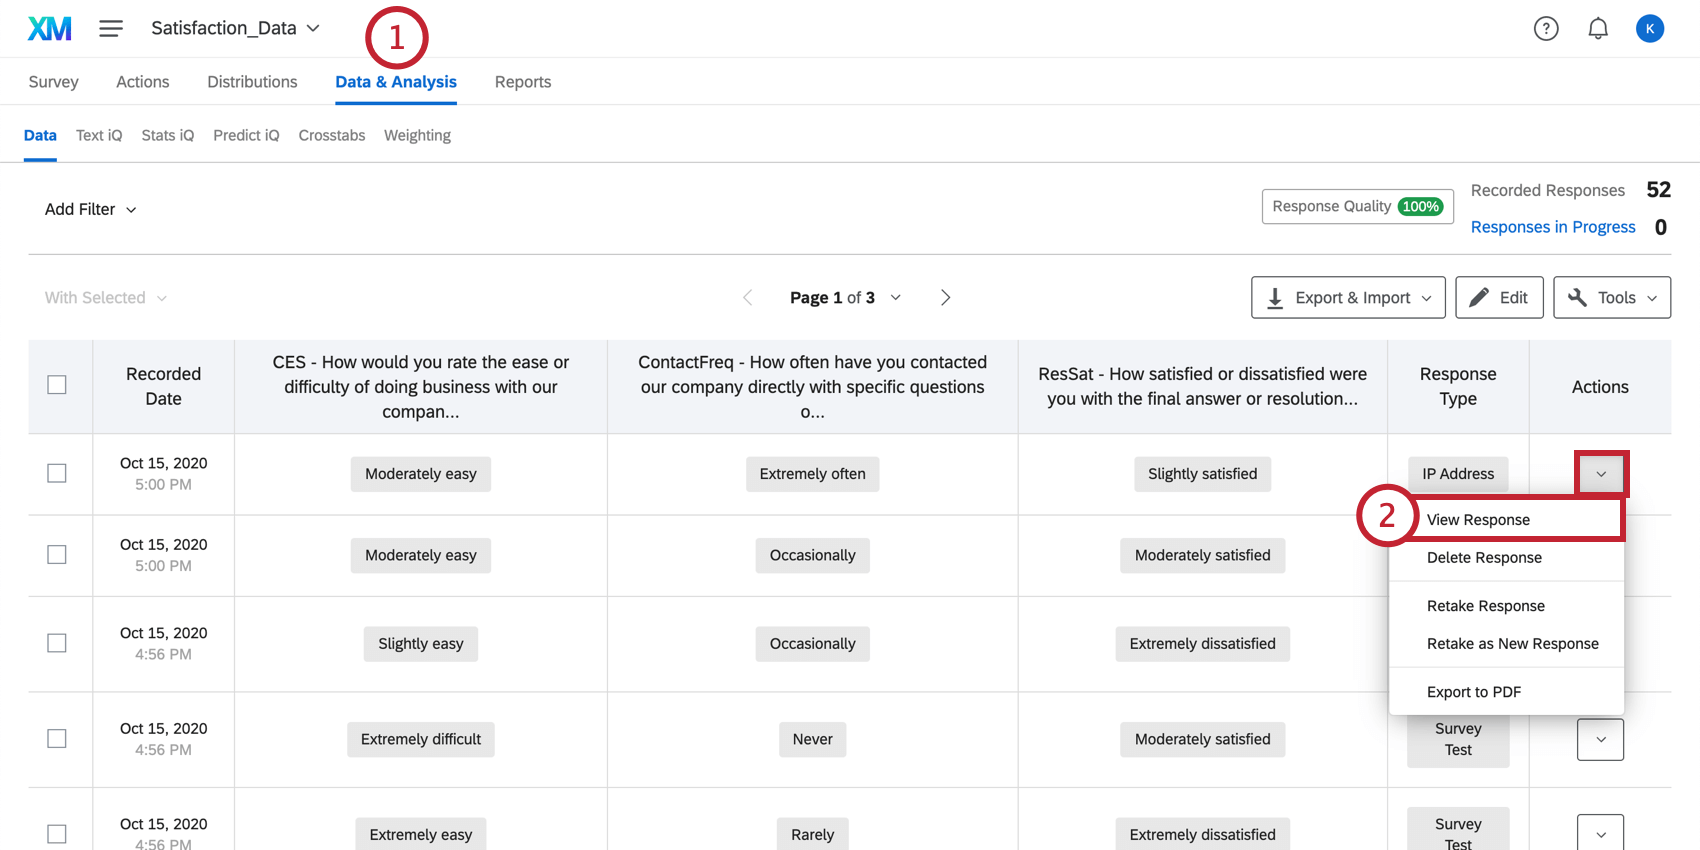 View response in the Data & Analysis tab